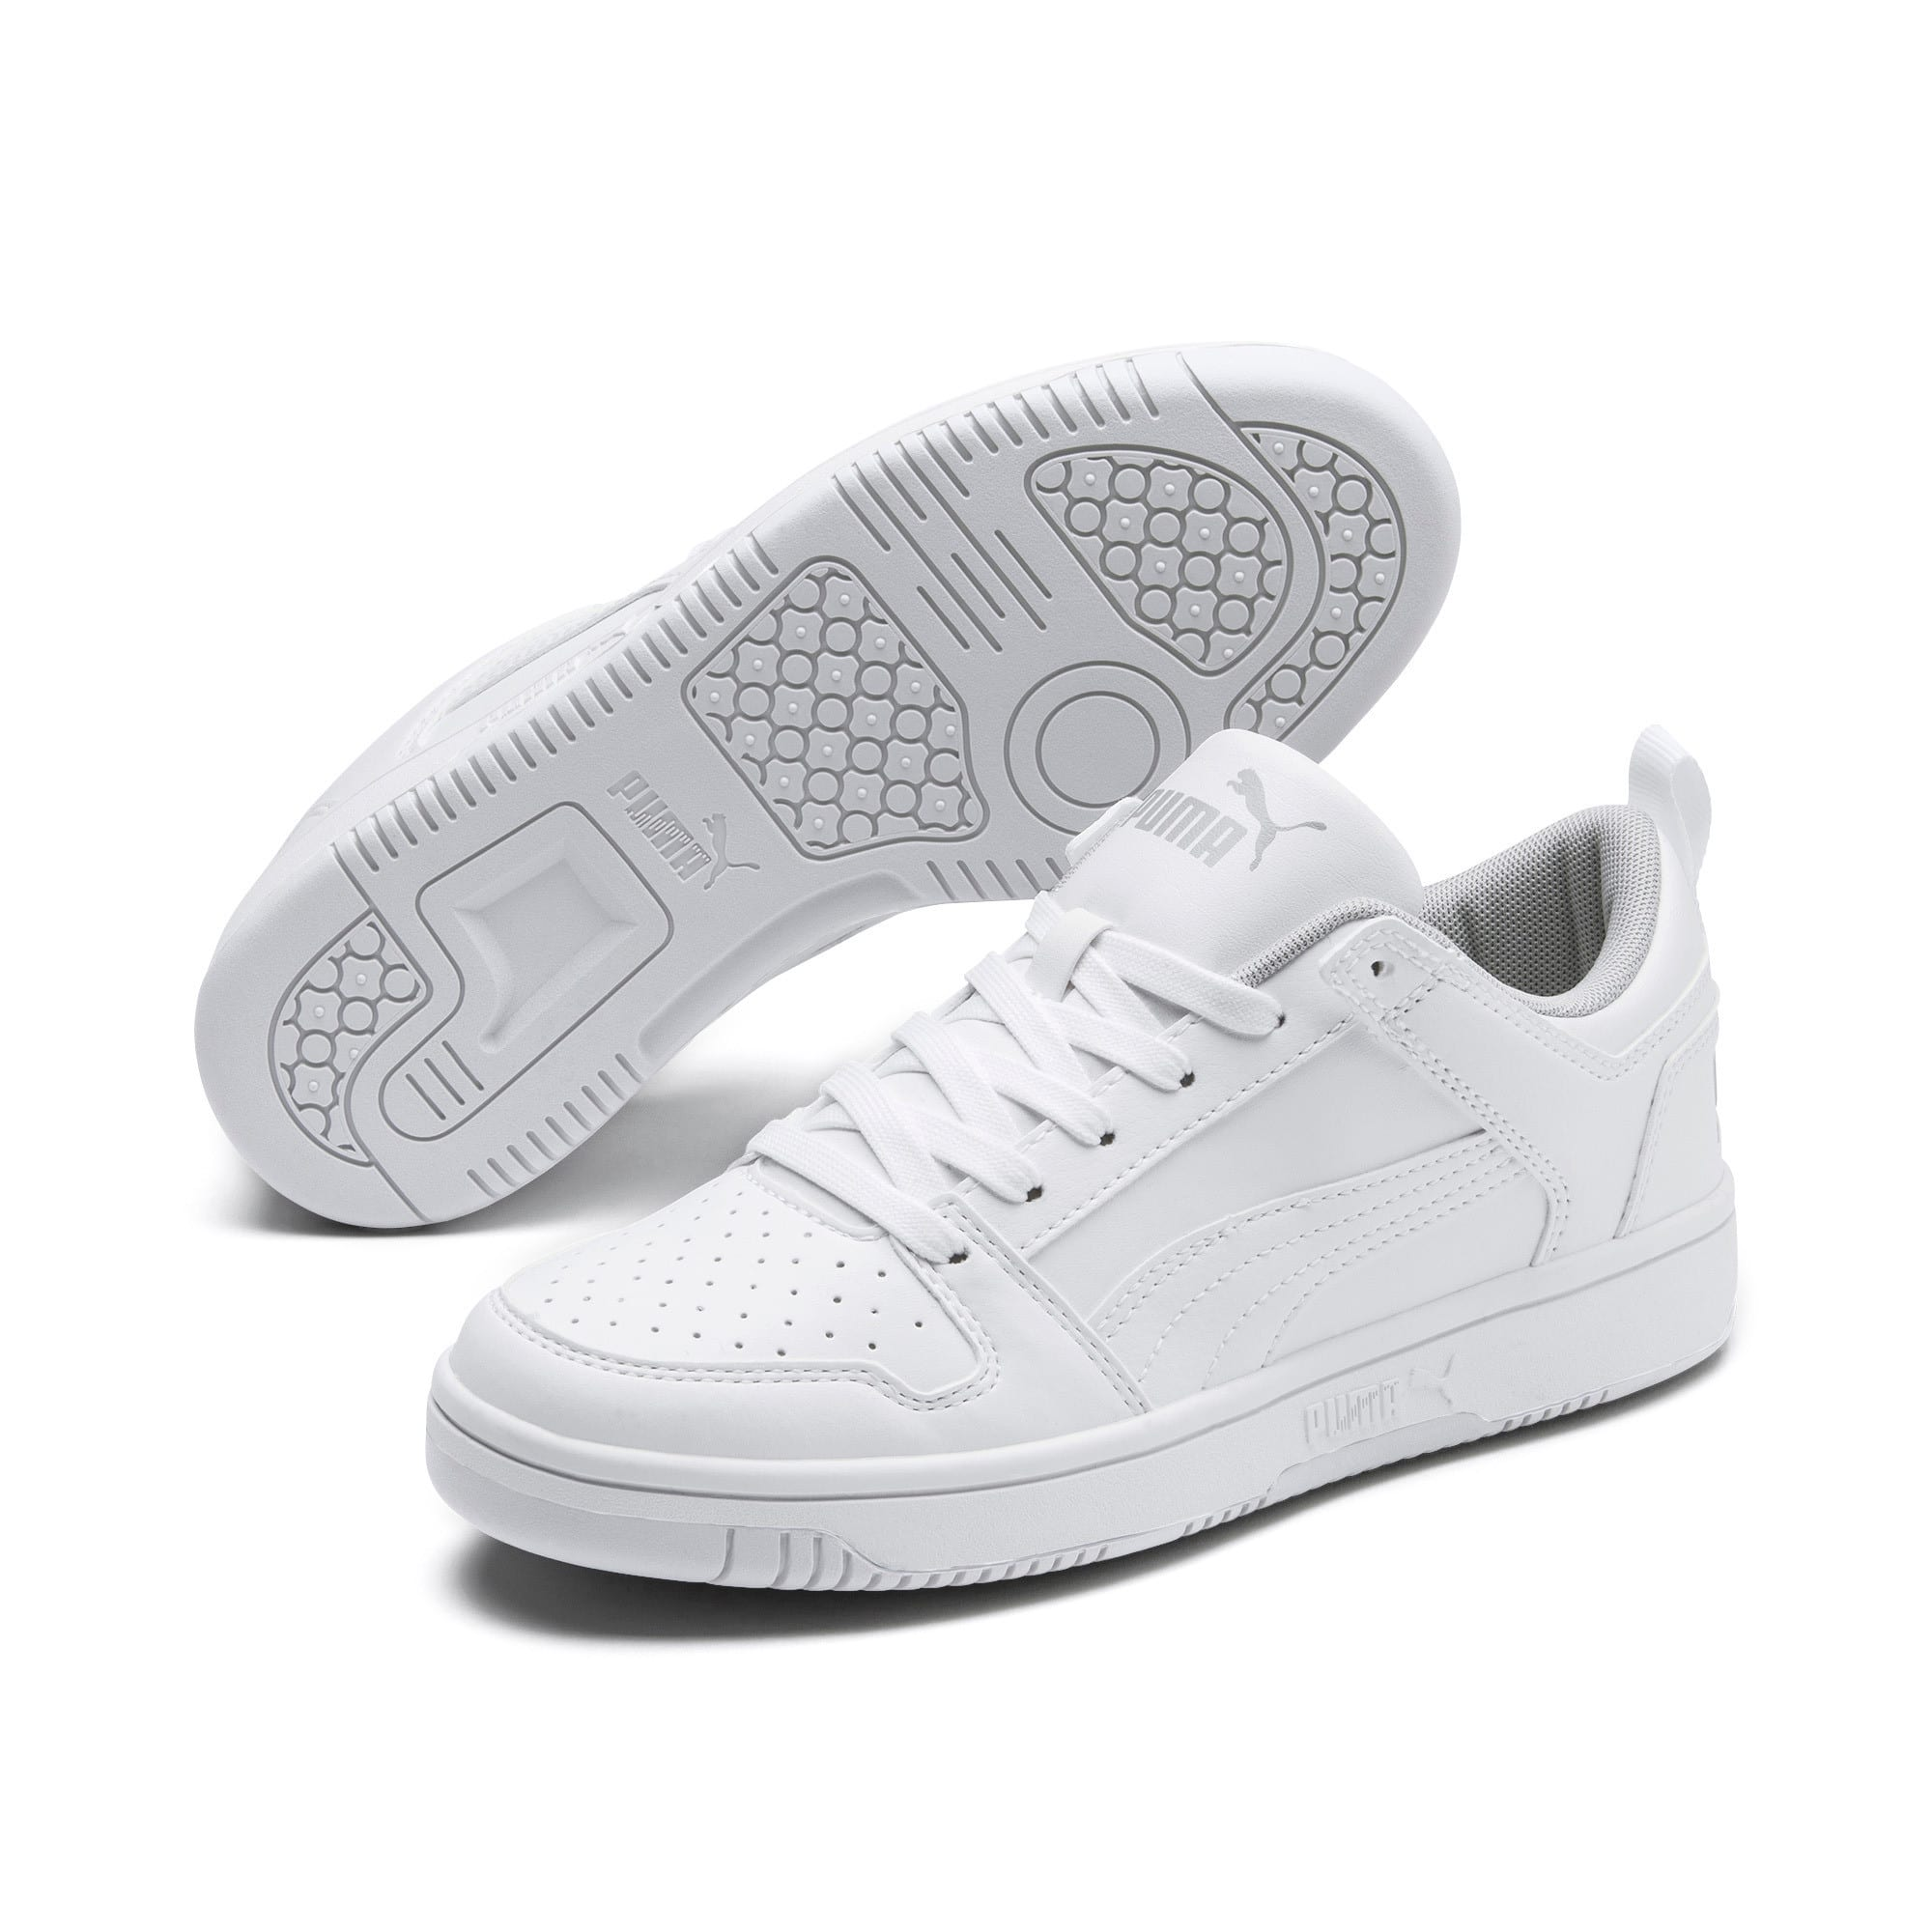 Thumbnail 2 of PUMA Rebound LayUp Lo Sneakers JR, Puma White-High Rise, medium